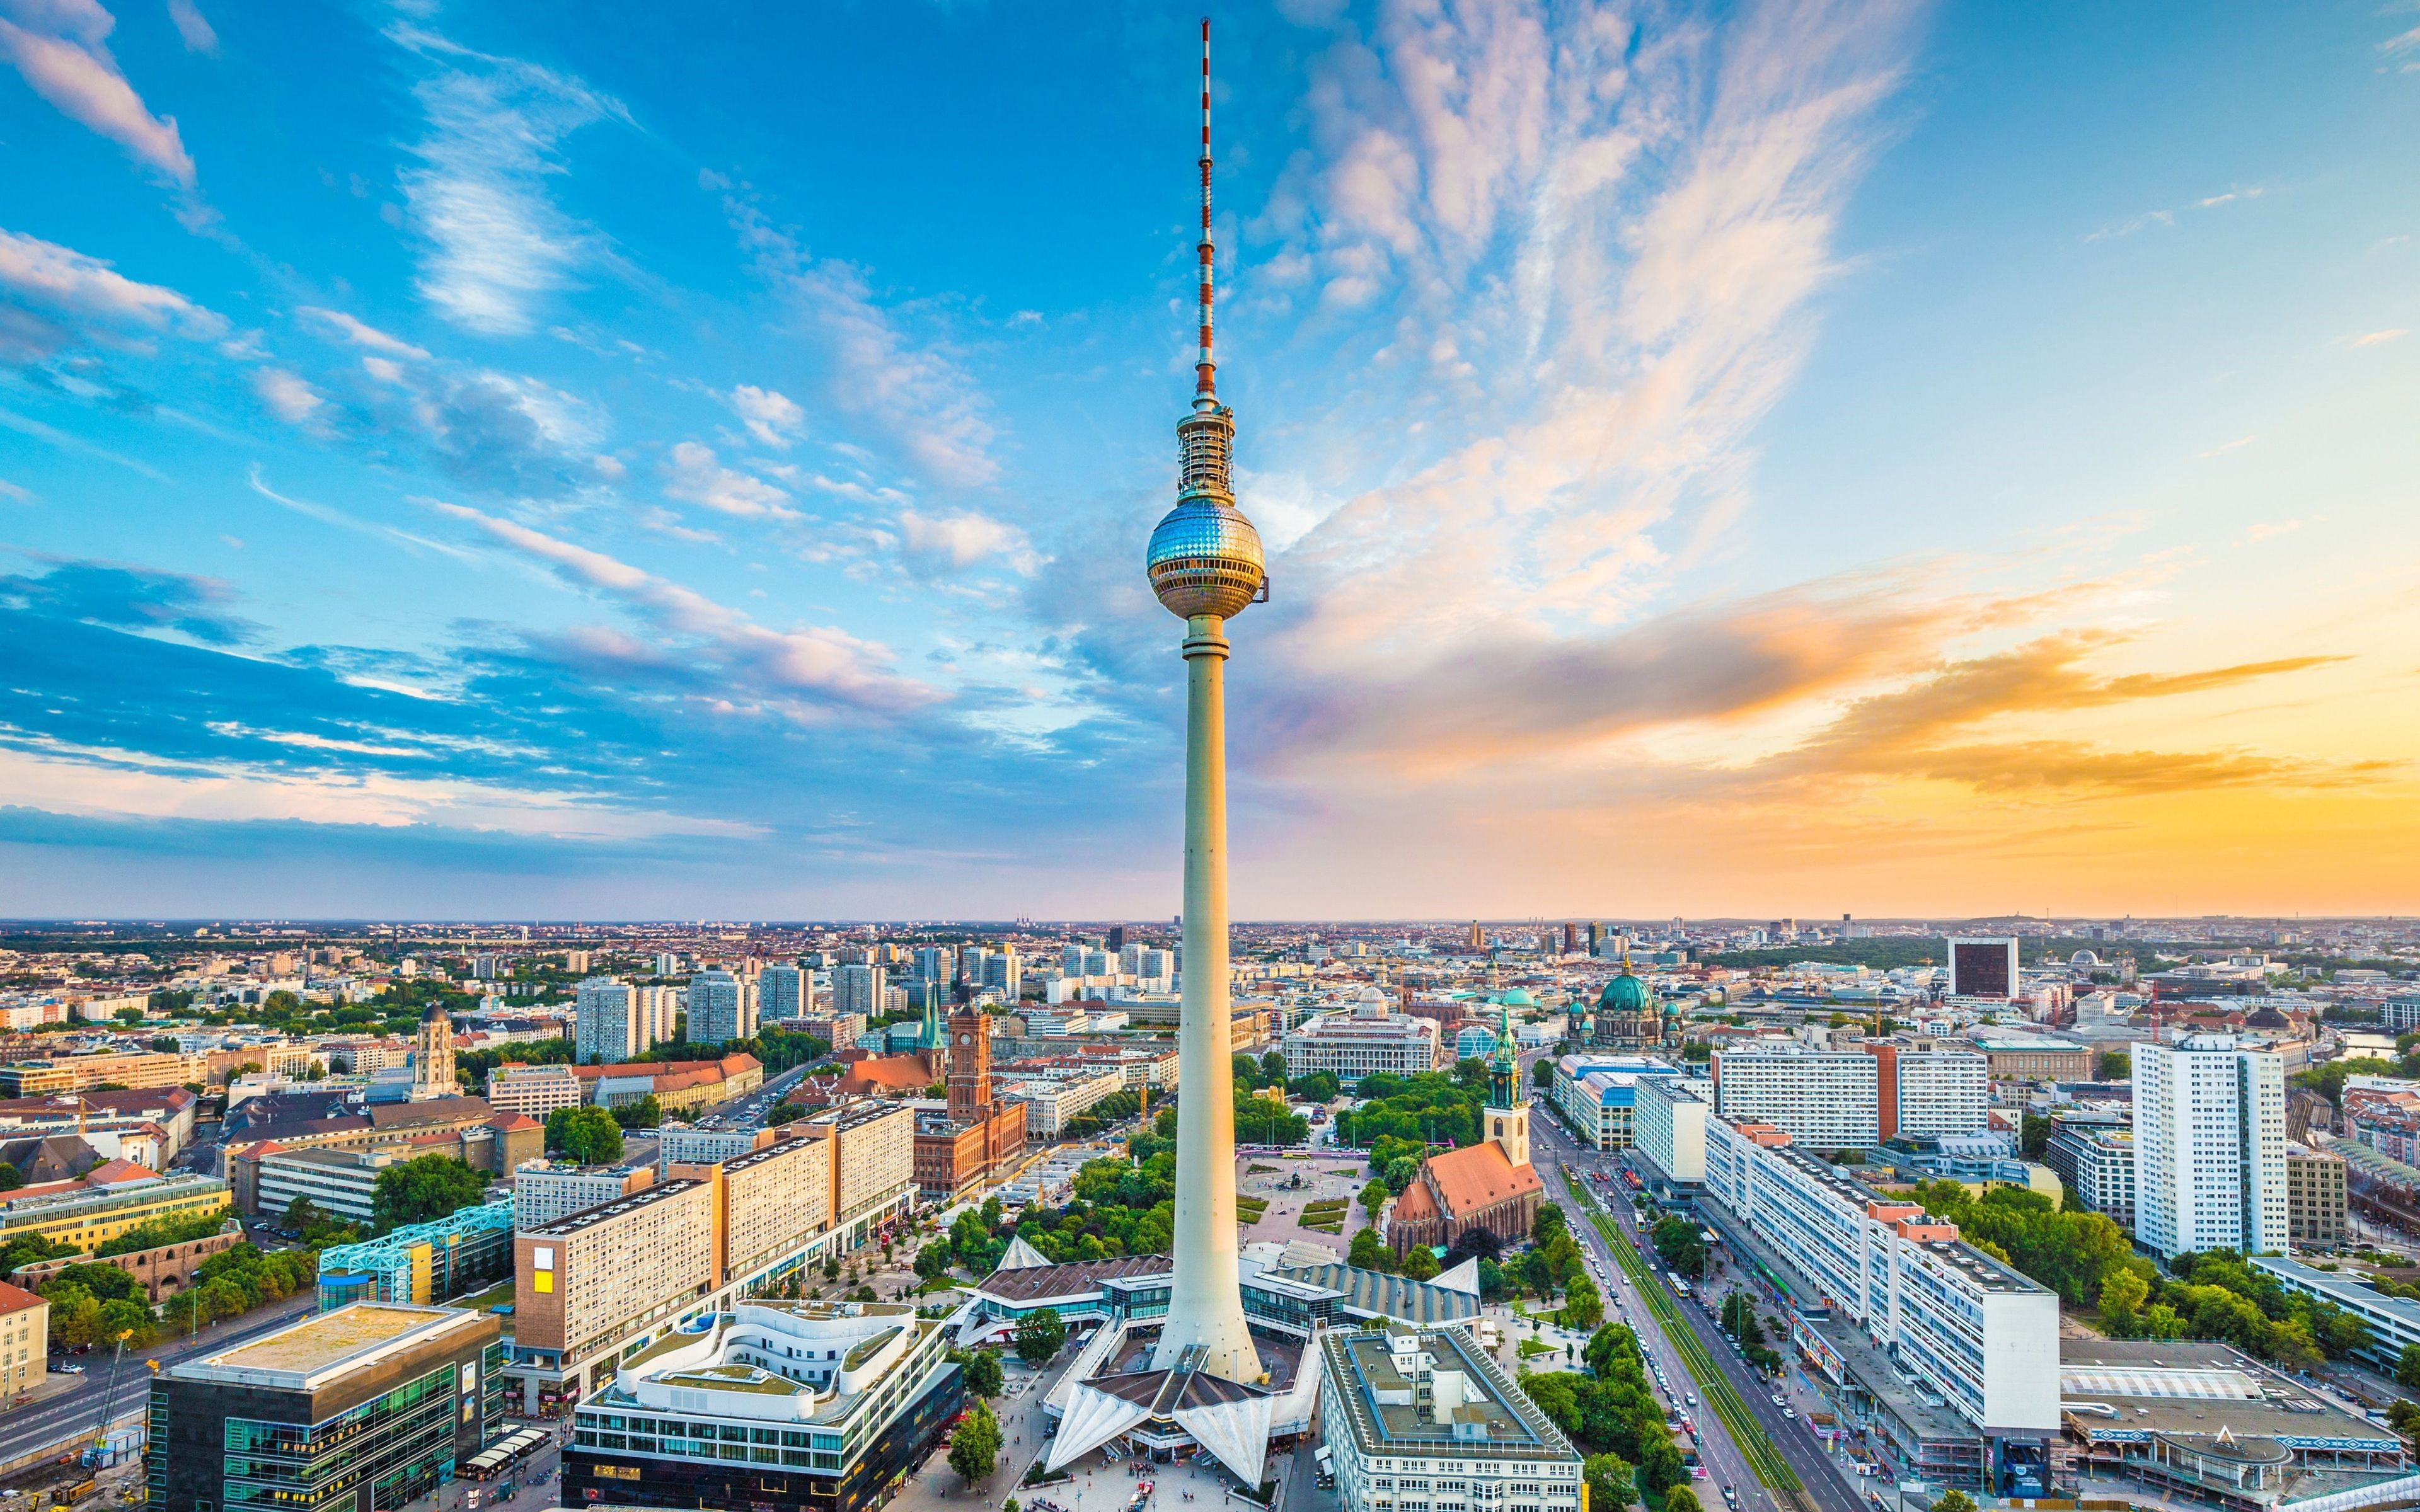 Berlin Wallpapers Cities In Germany Berlin Backpack Europe Route